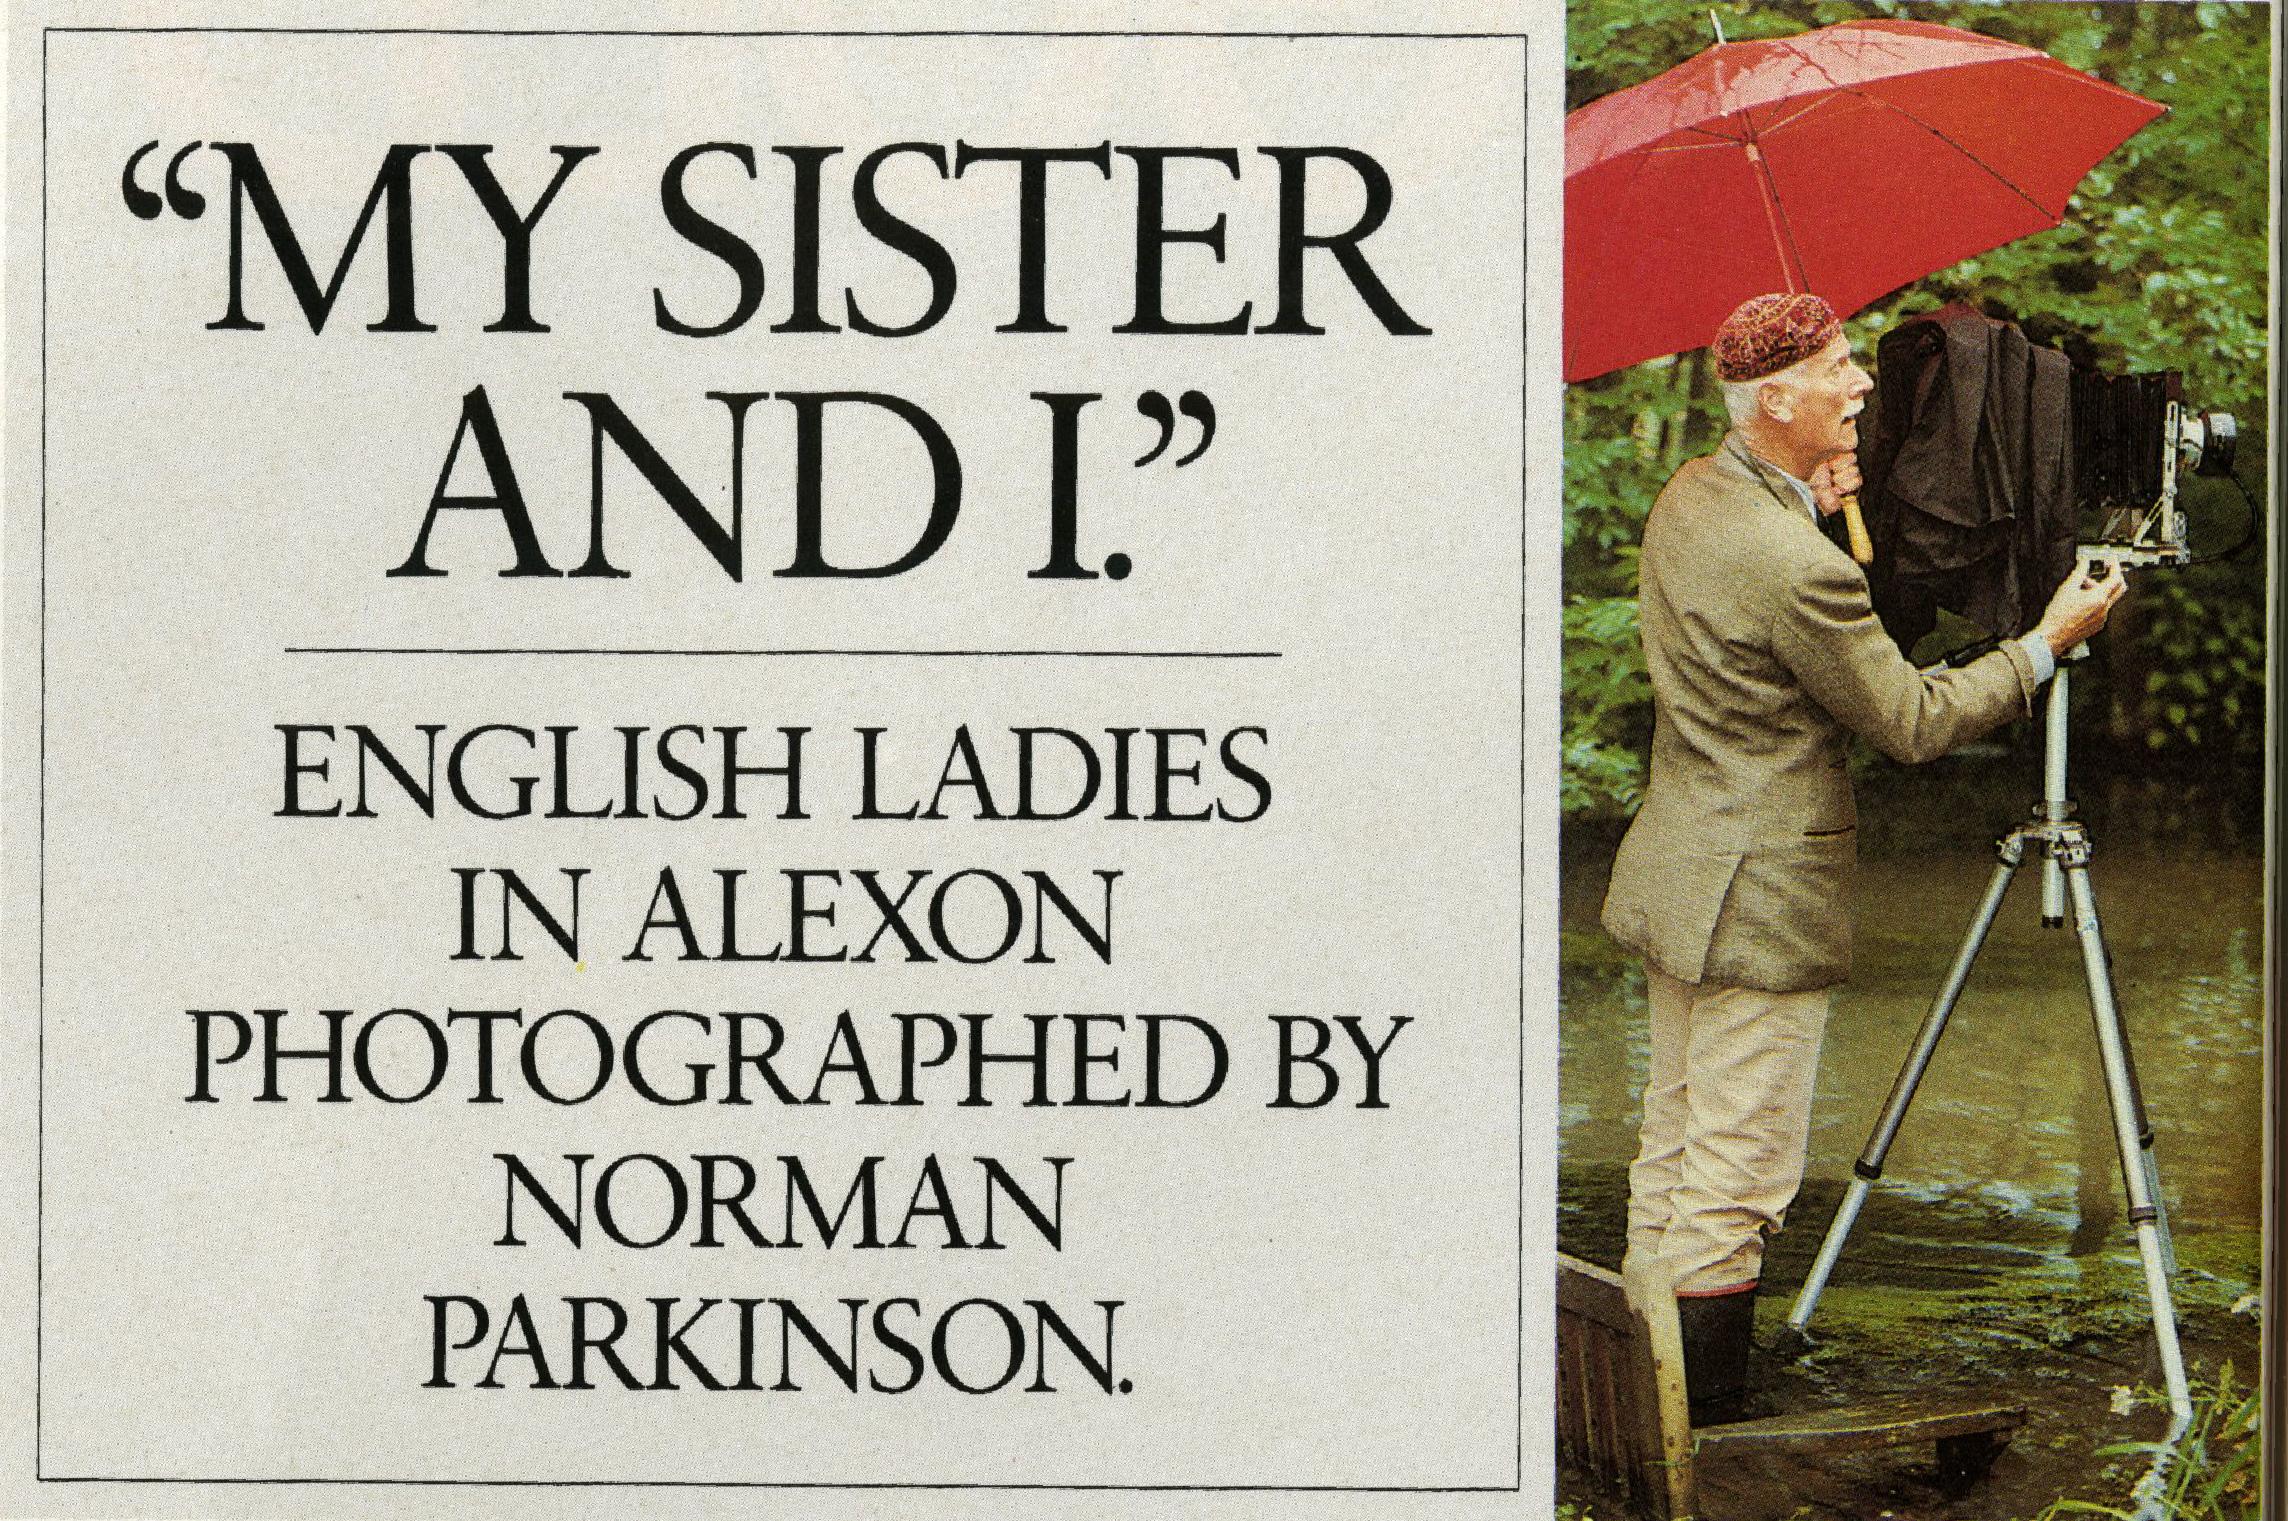 Paul Arden, Avedon 'Norman Parkinson'-01